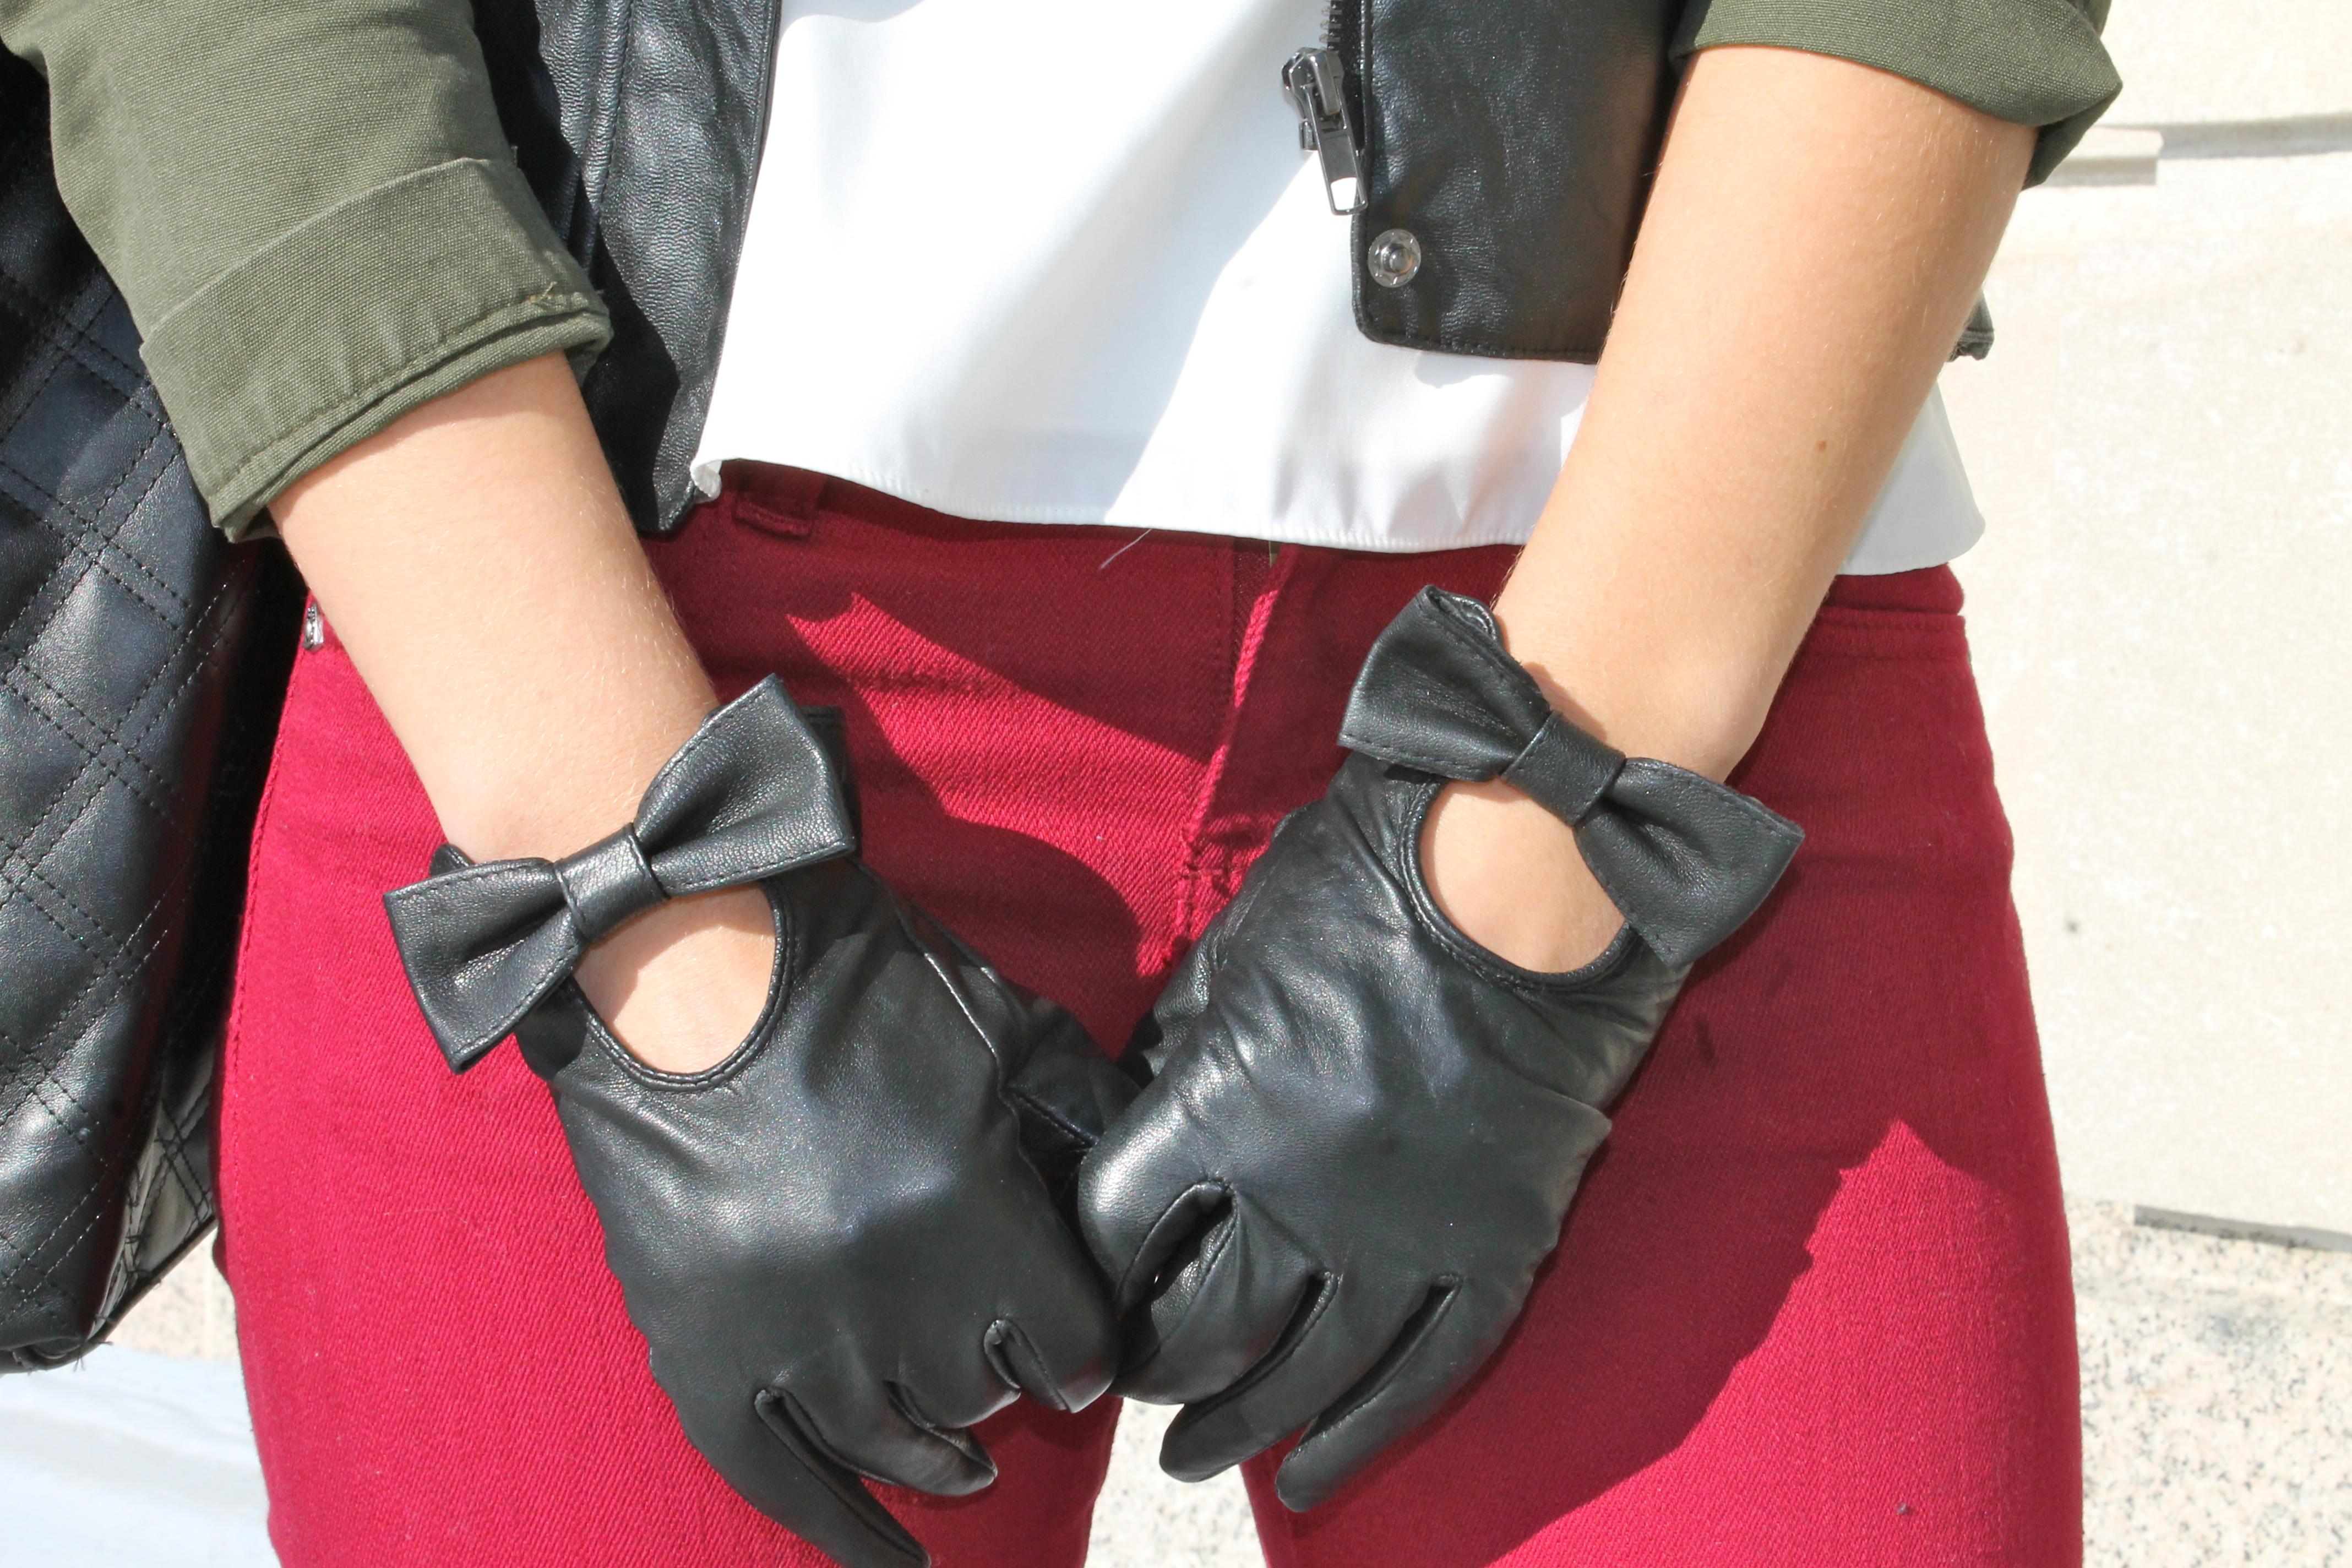 Black gloves with bow - Img_3963 Img_3976 Img_3993 Img_3997 Img_4015 Img_4026 Img_4027 Img_4005